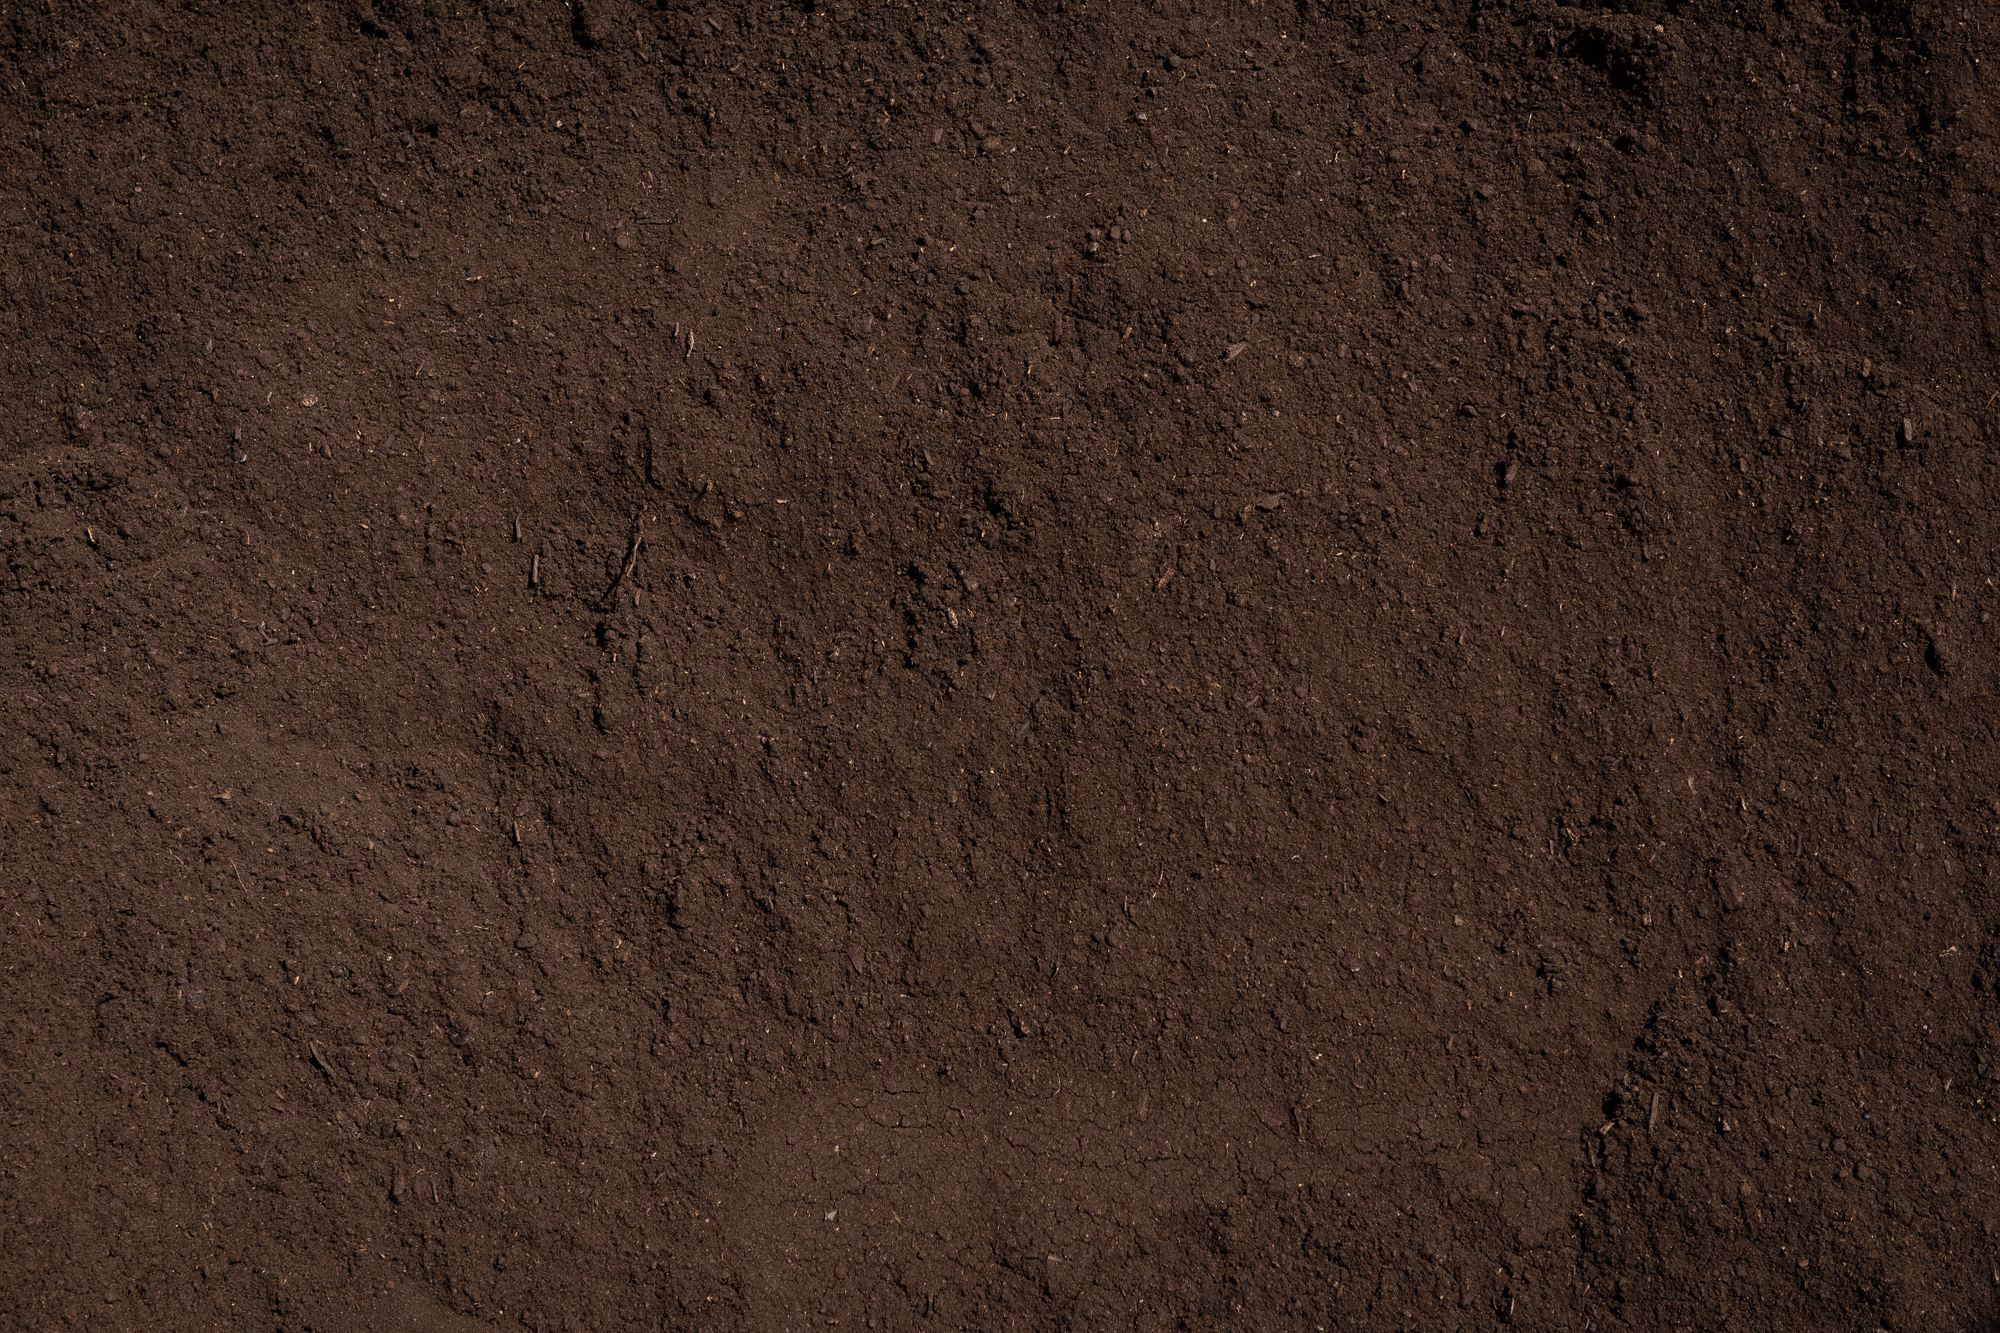 Terre et semences